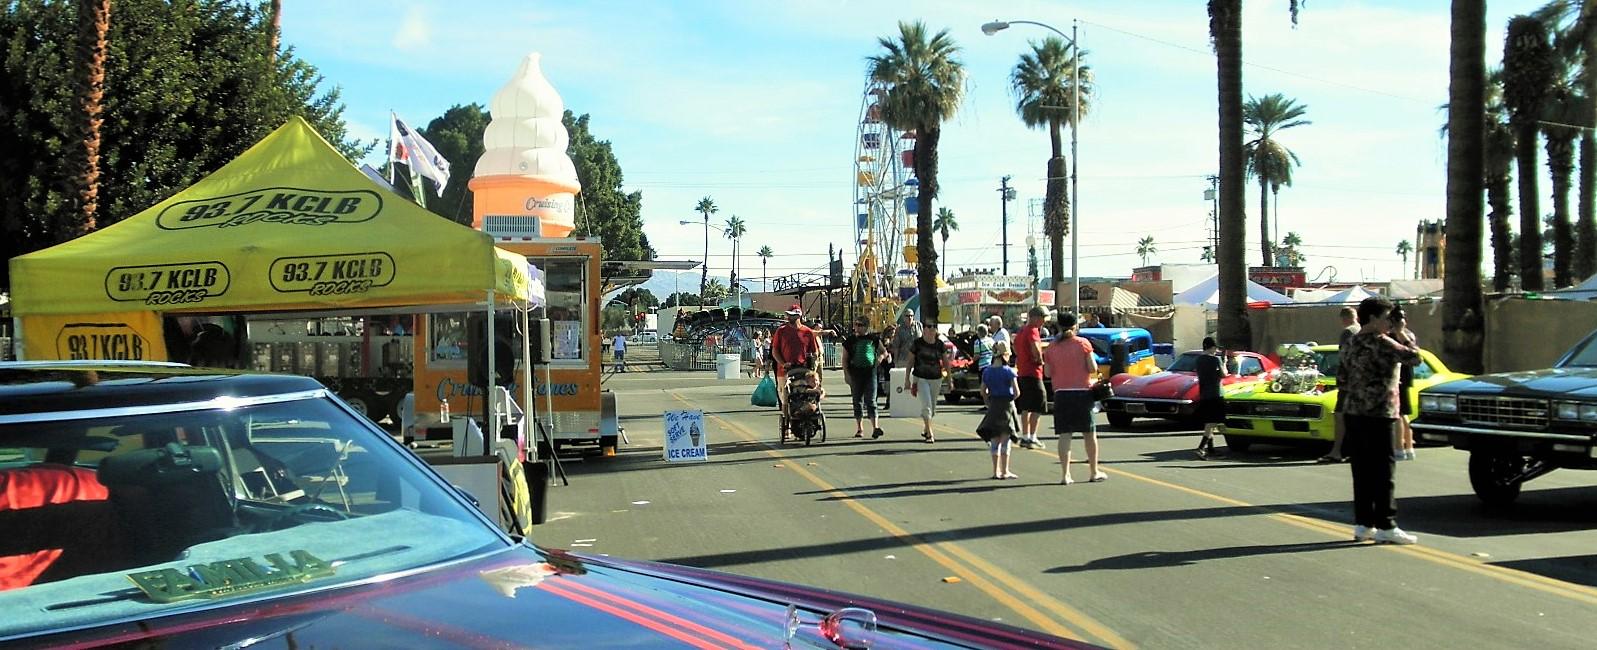 Tamale Festival, Indio, CA